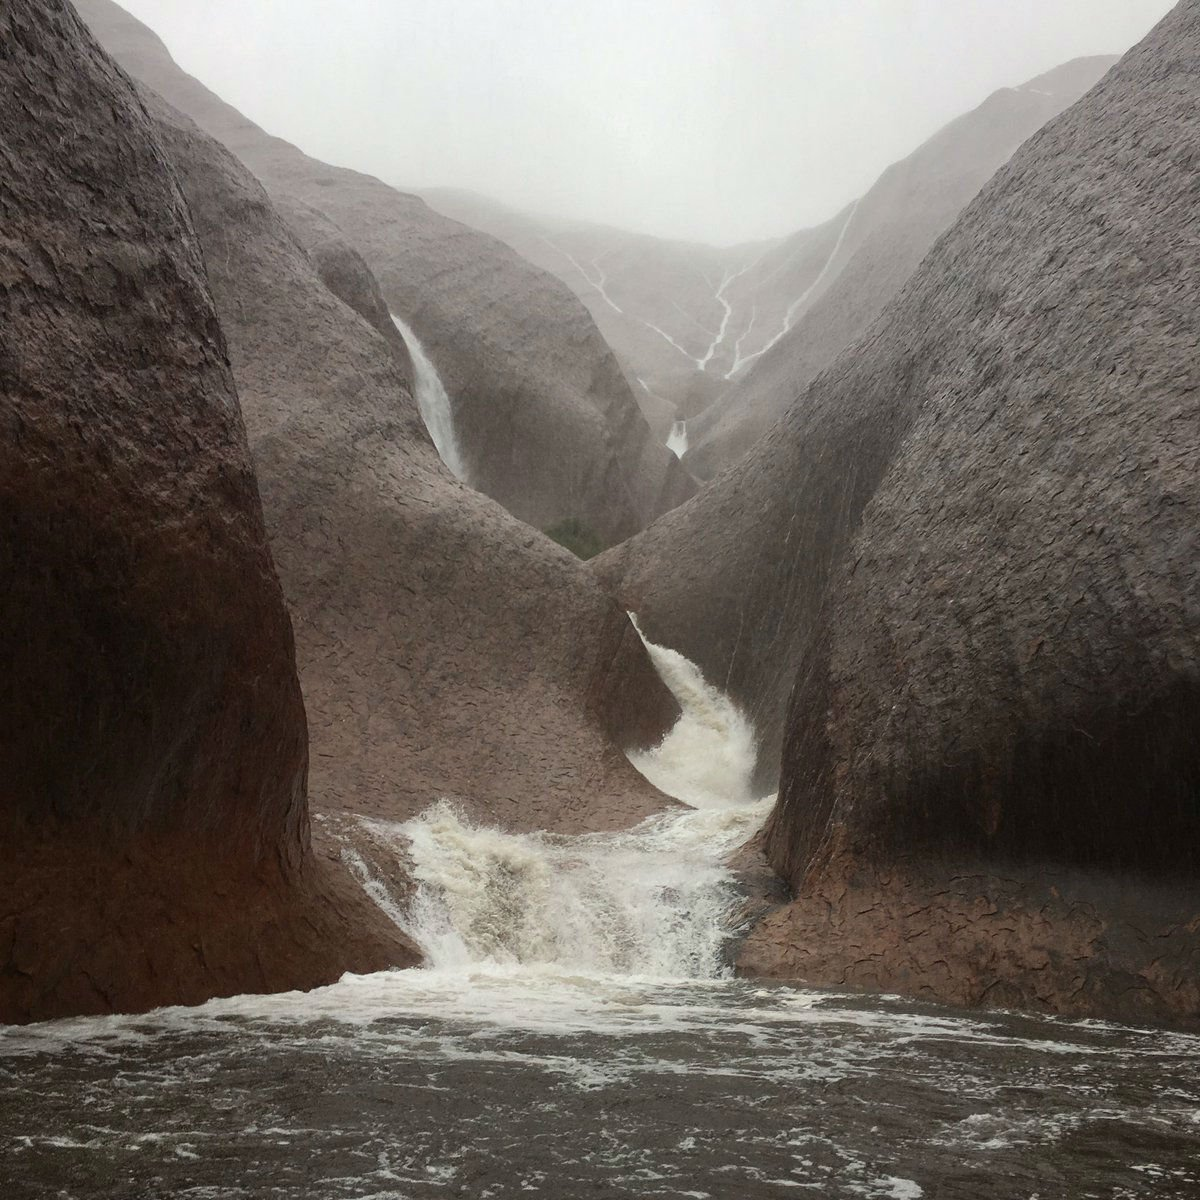 Uluru Became A Massive Waterfall After Extreme Rains